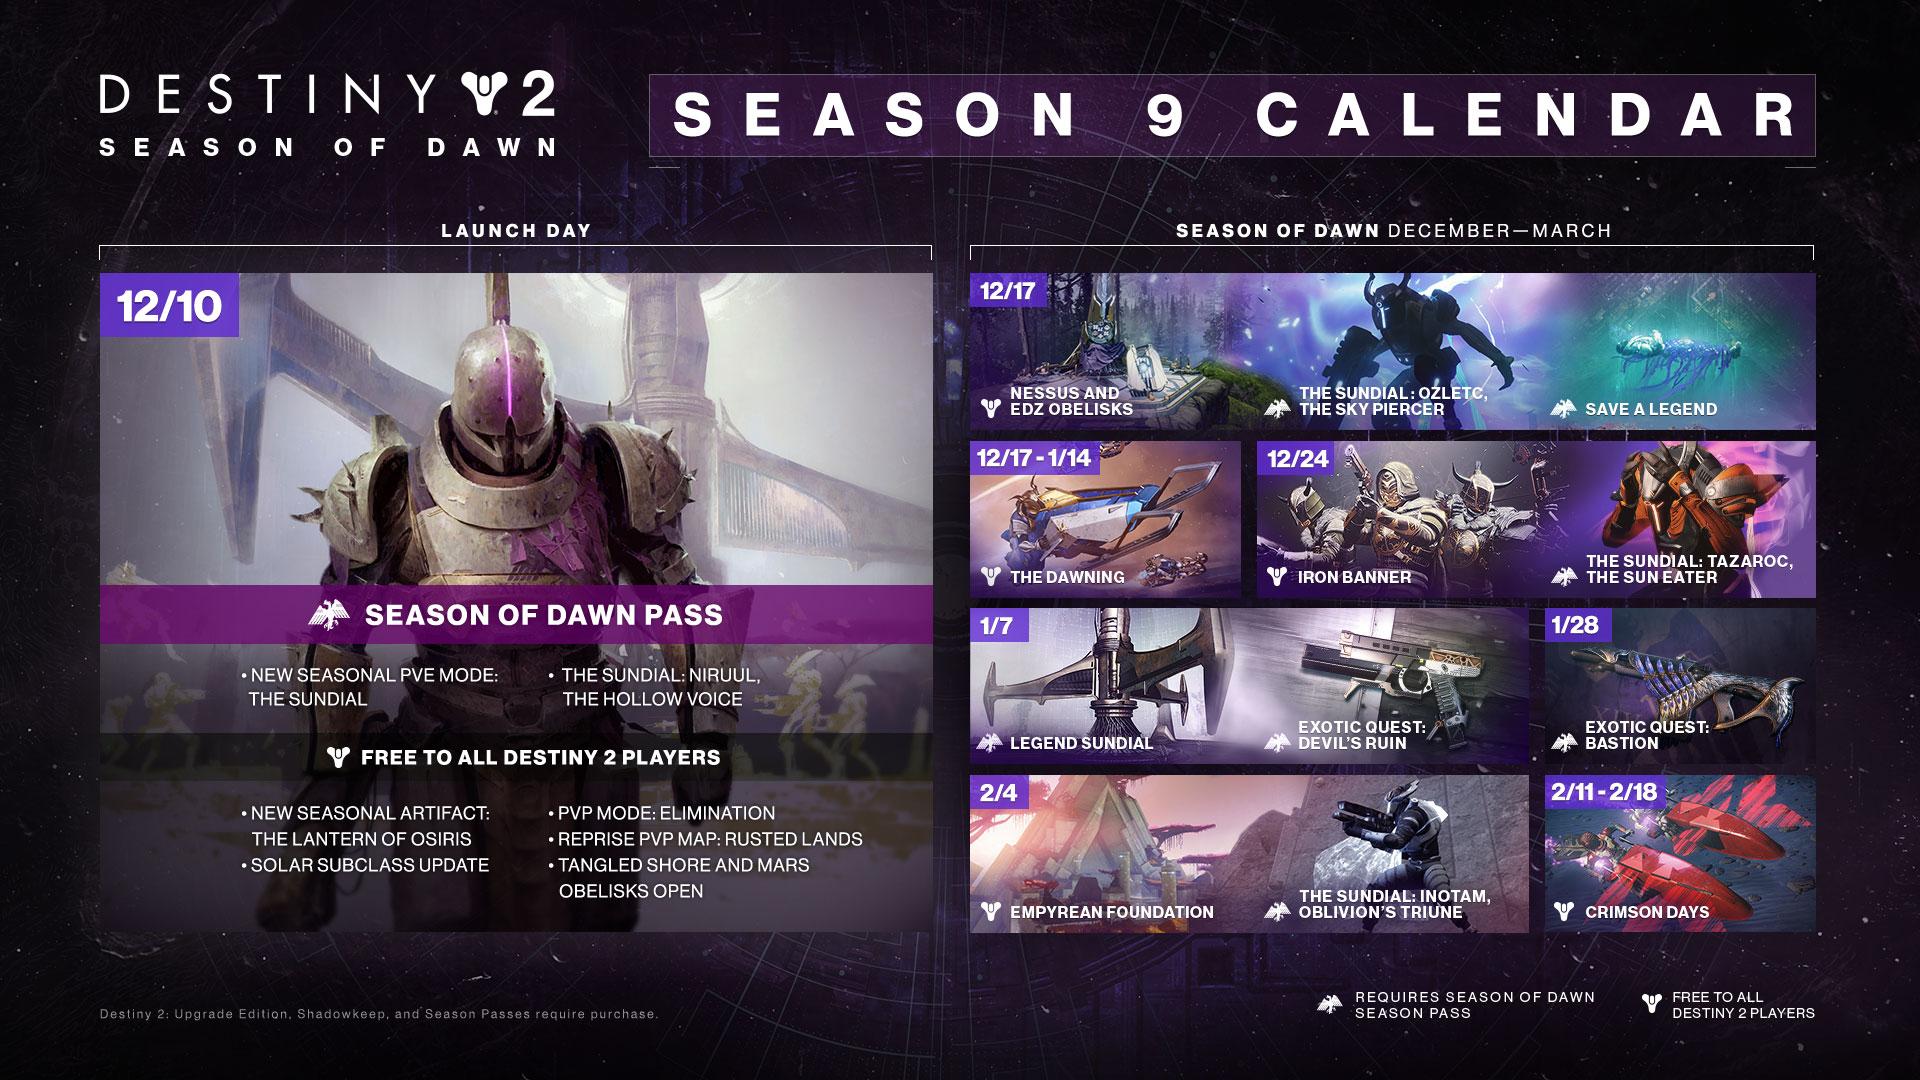 Destiny 2 - Temporada del Alba